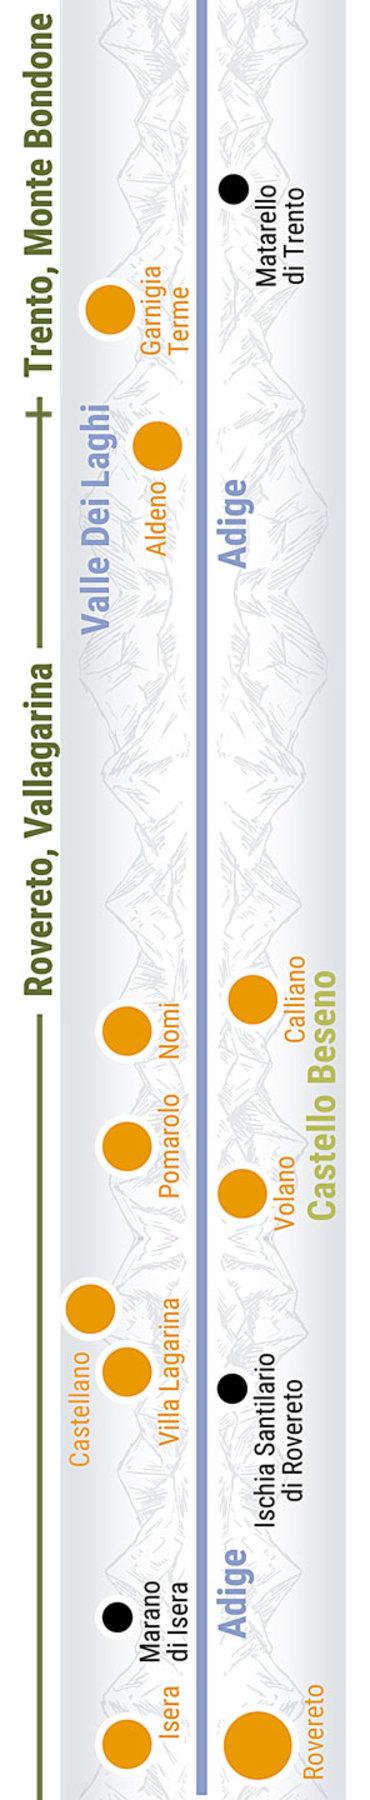 Übersichtskarte rechts Teilabschnitt 32p Vallagarina Nord